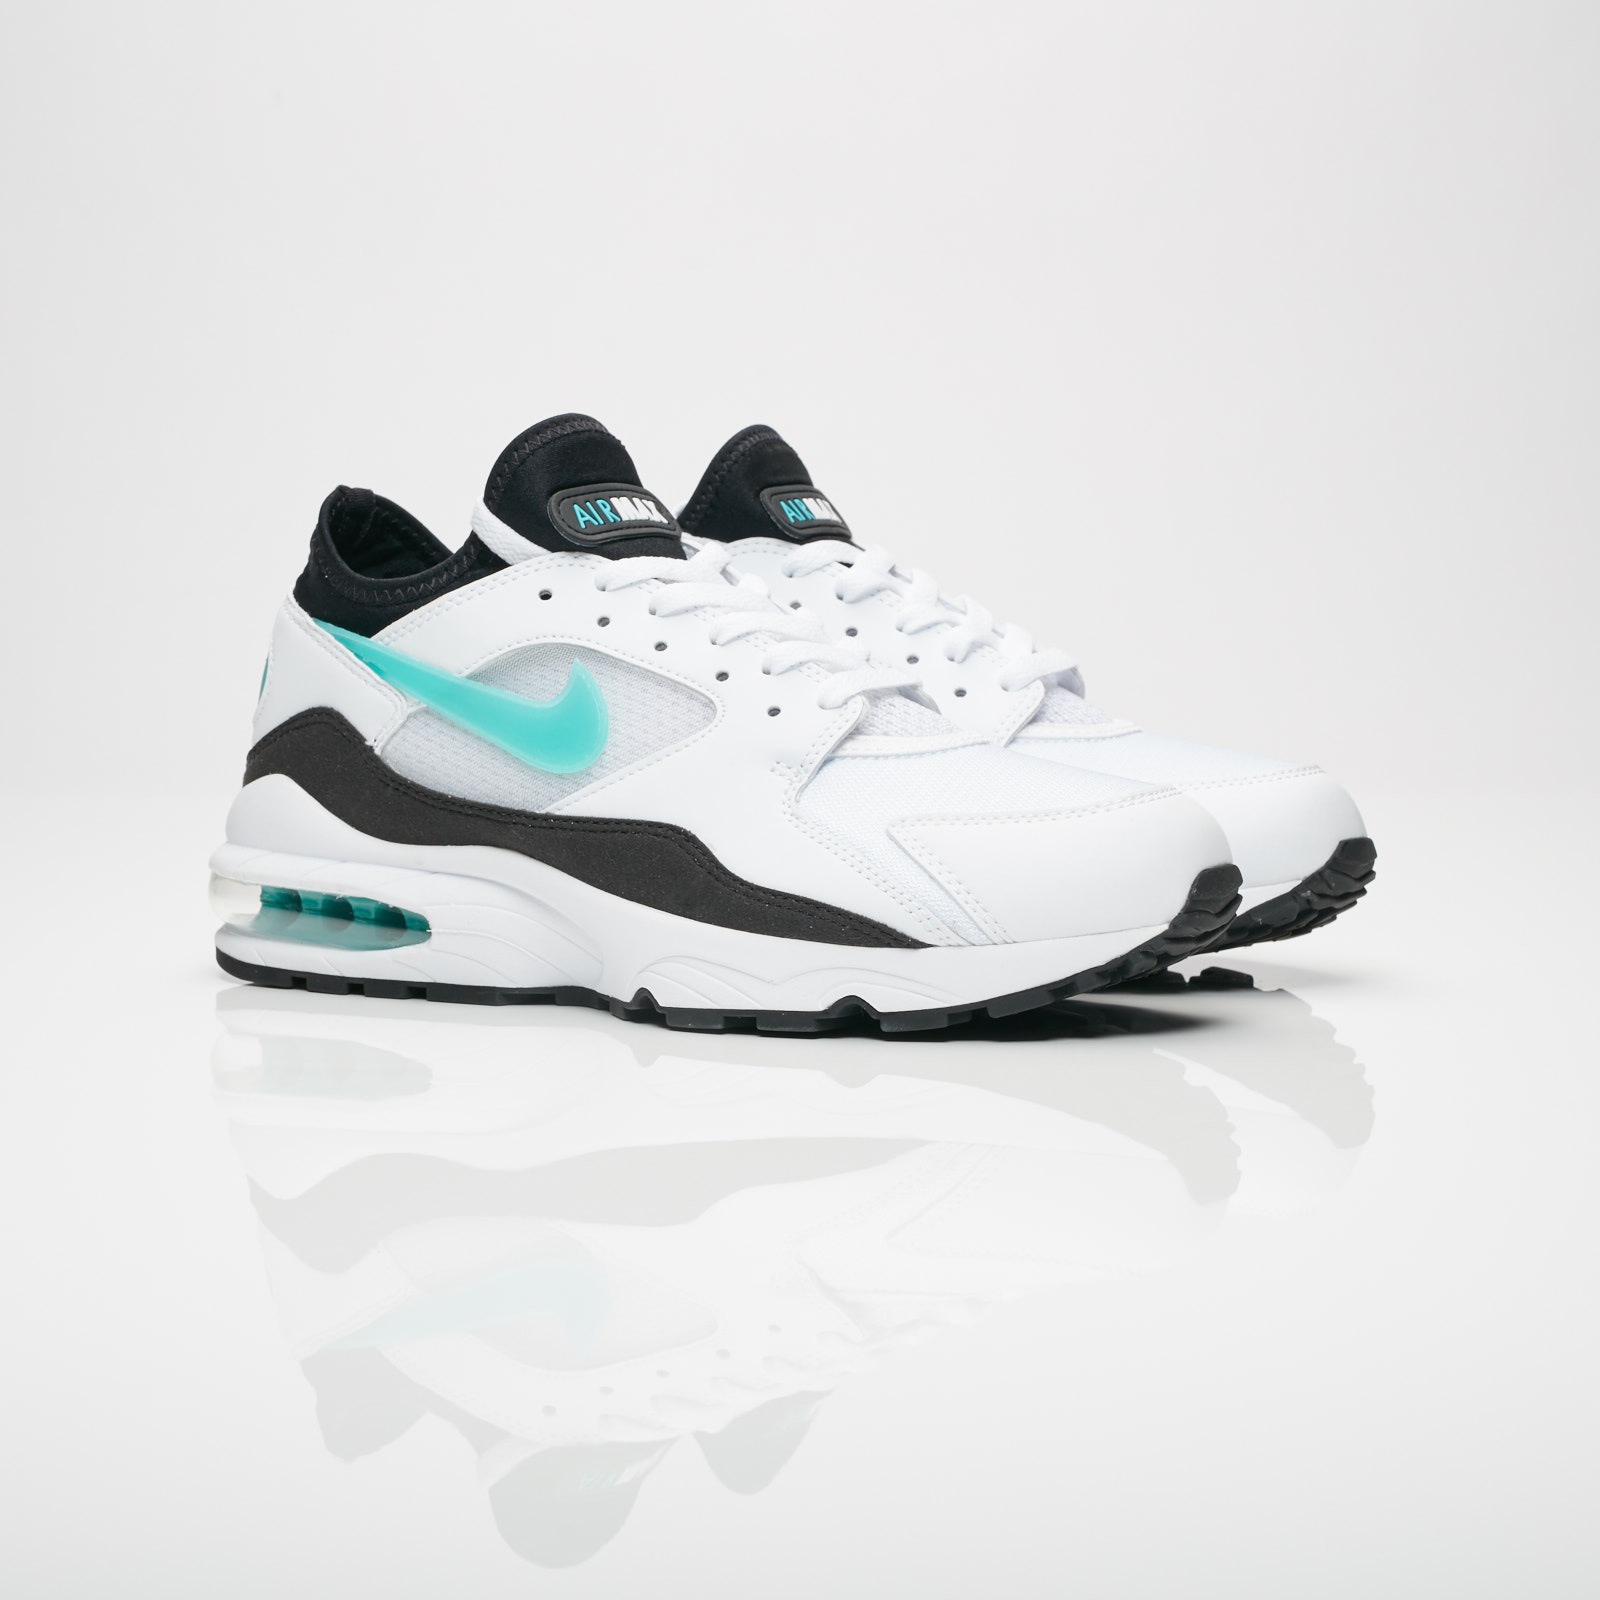 67eb15ee38e2 Nike Air Max 93 - 306551-107 - Sneakersnstuff